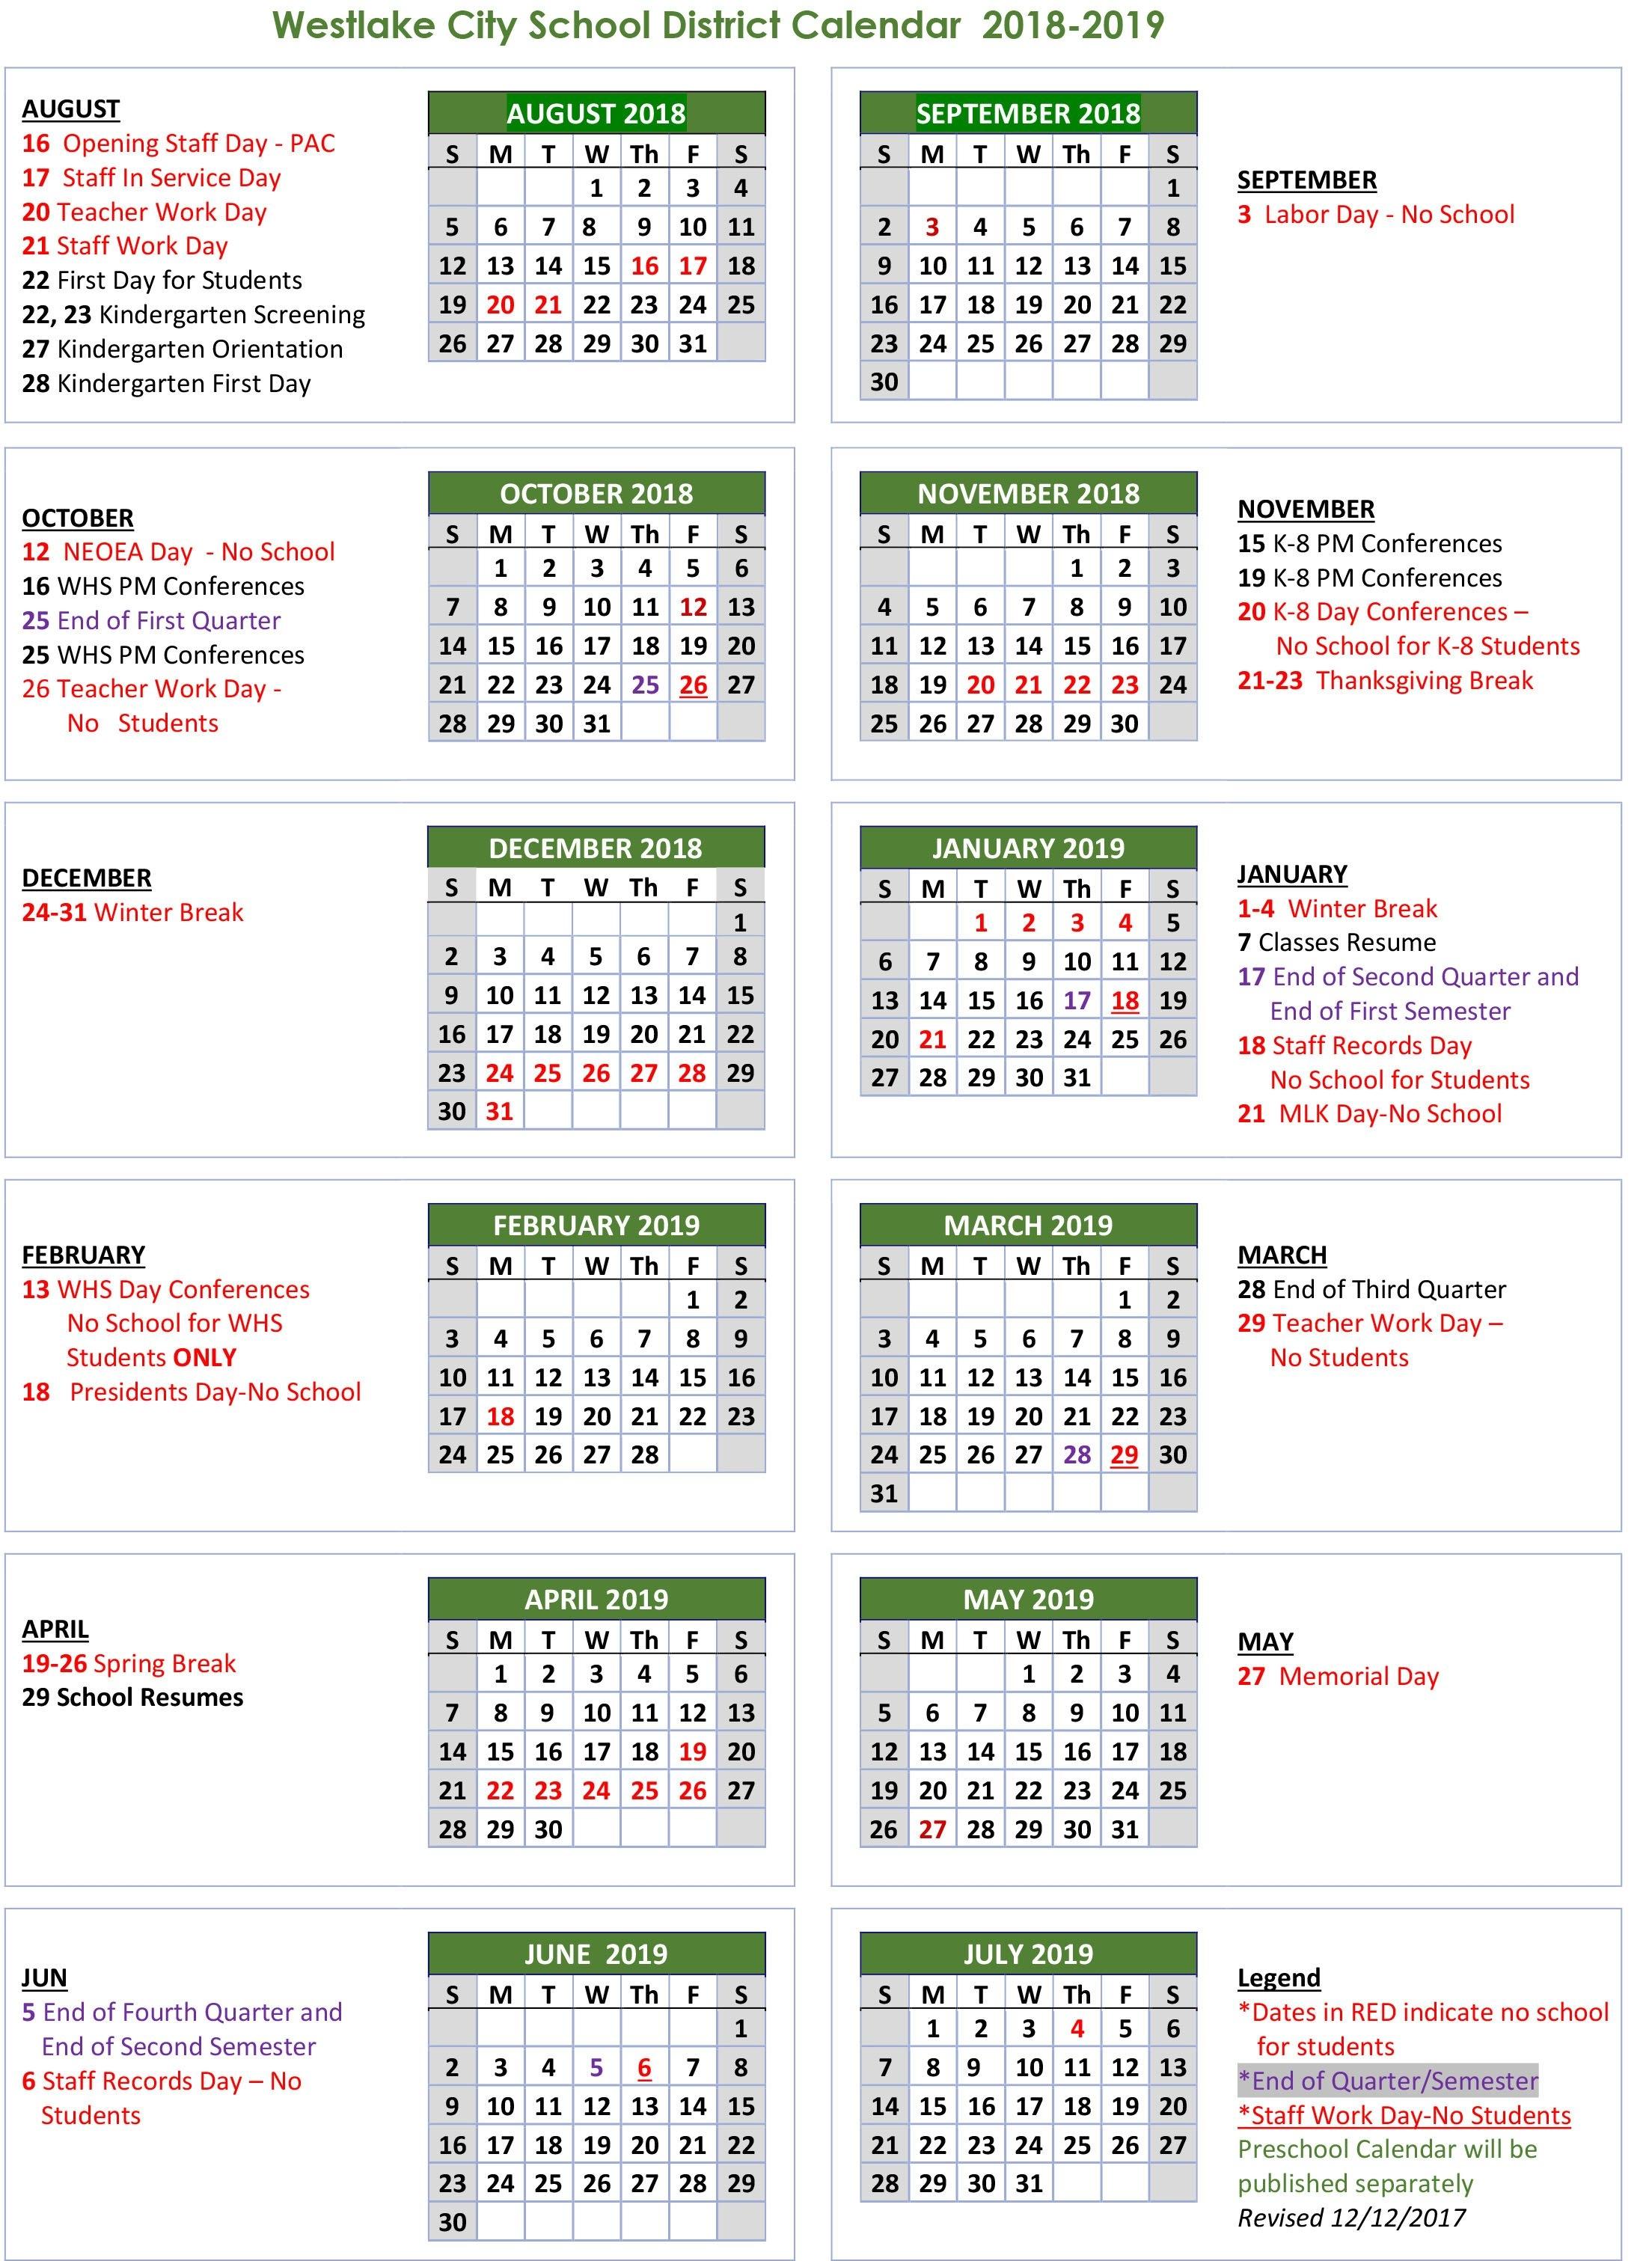 School Calendar – Westlake City School District Calendar 2019 Spring Break